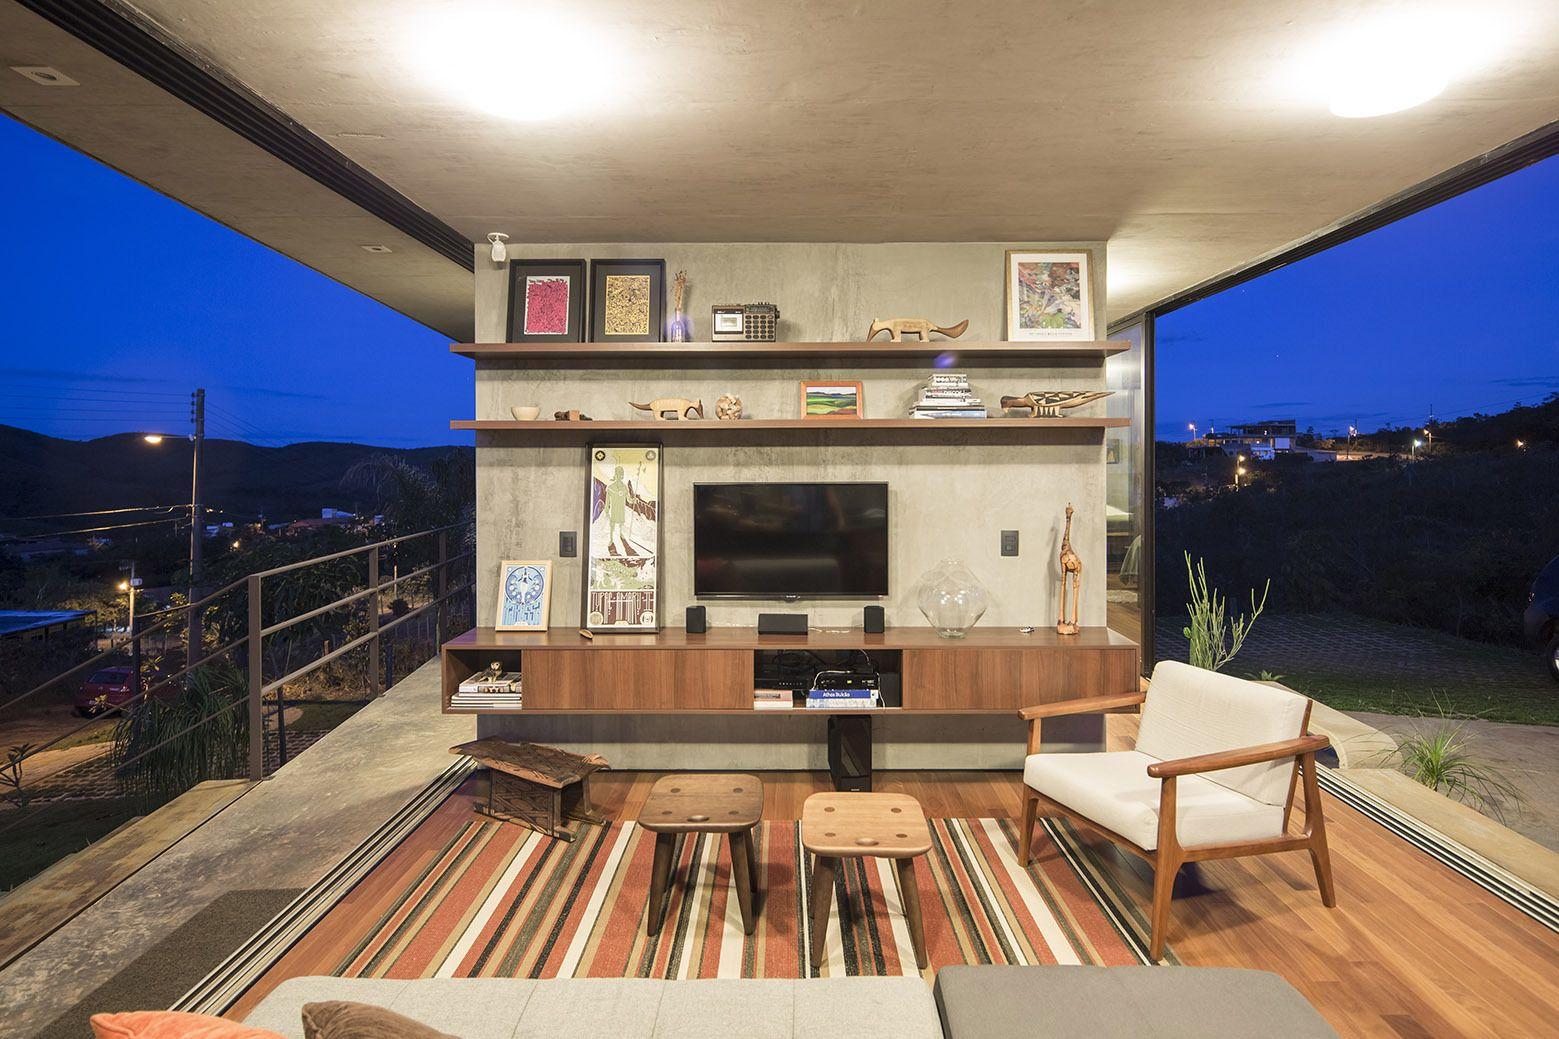 Galeria - Casa Solar da Serra / 3.4 Arquitetura - 4